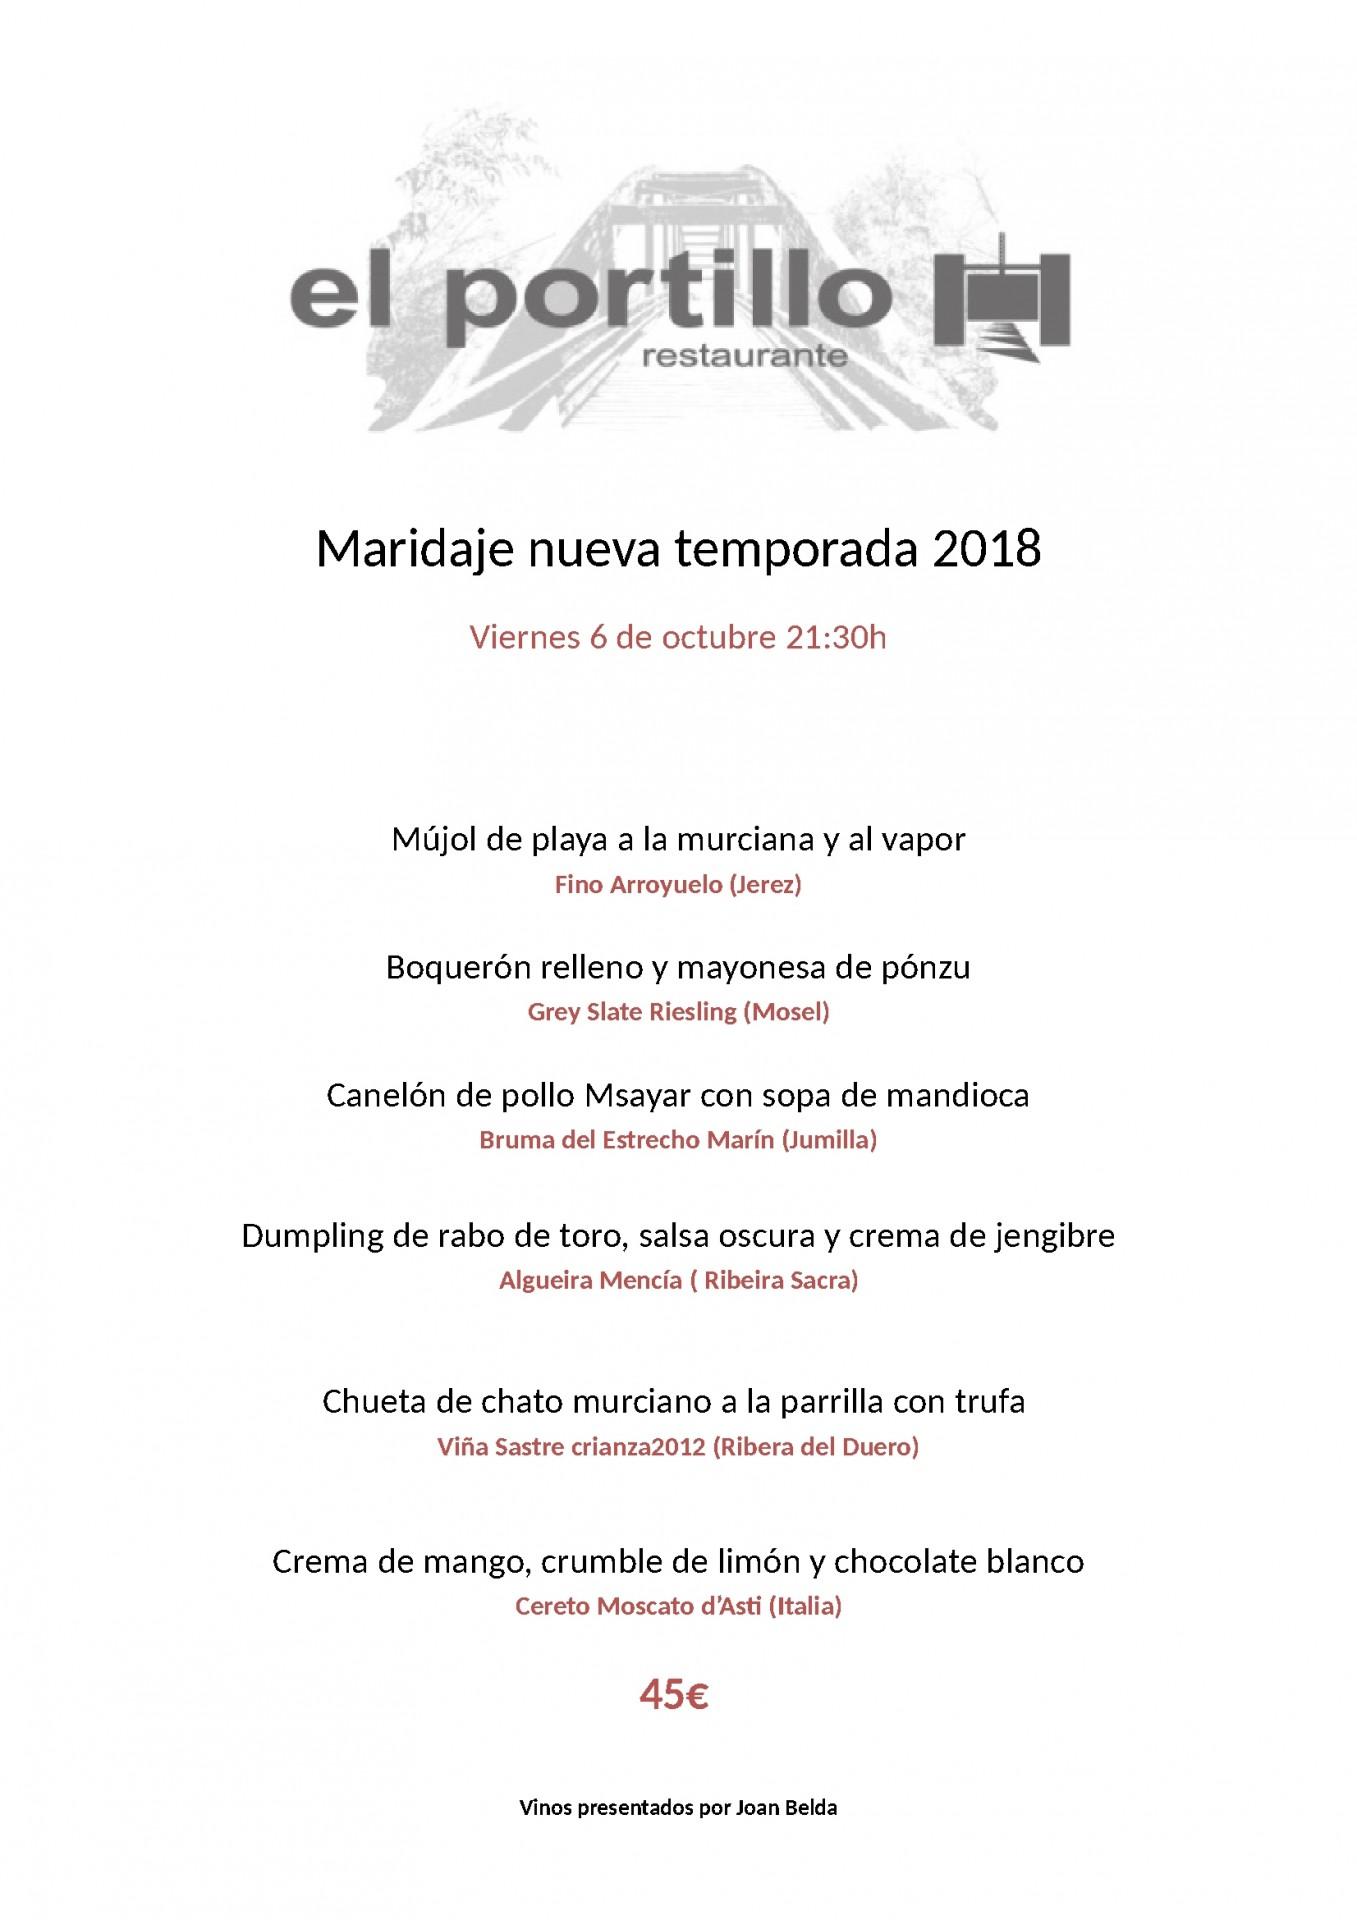 Maridaje_nueva_temporada_2018